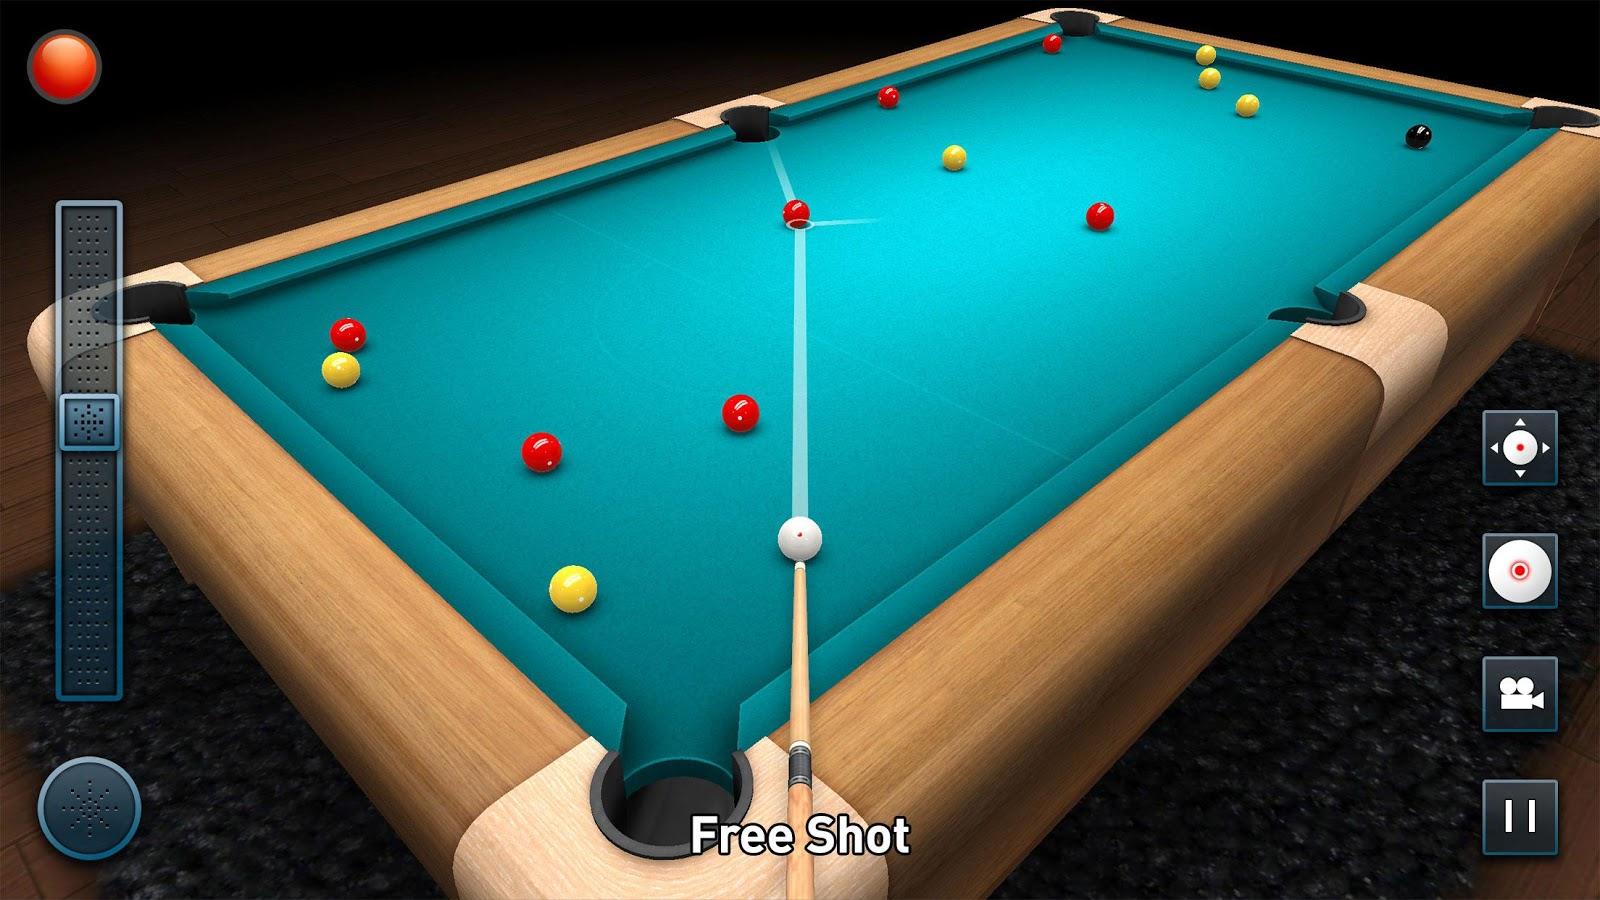 Pool Games - Play Pool Games on Free Online Games